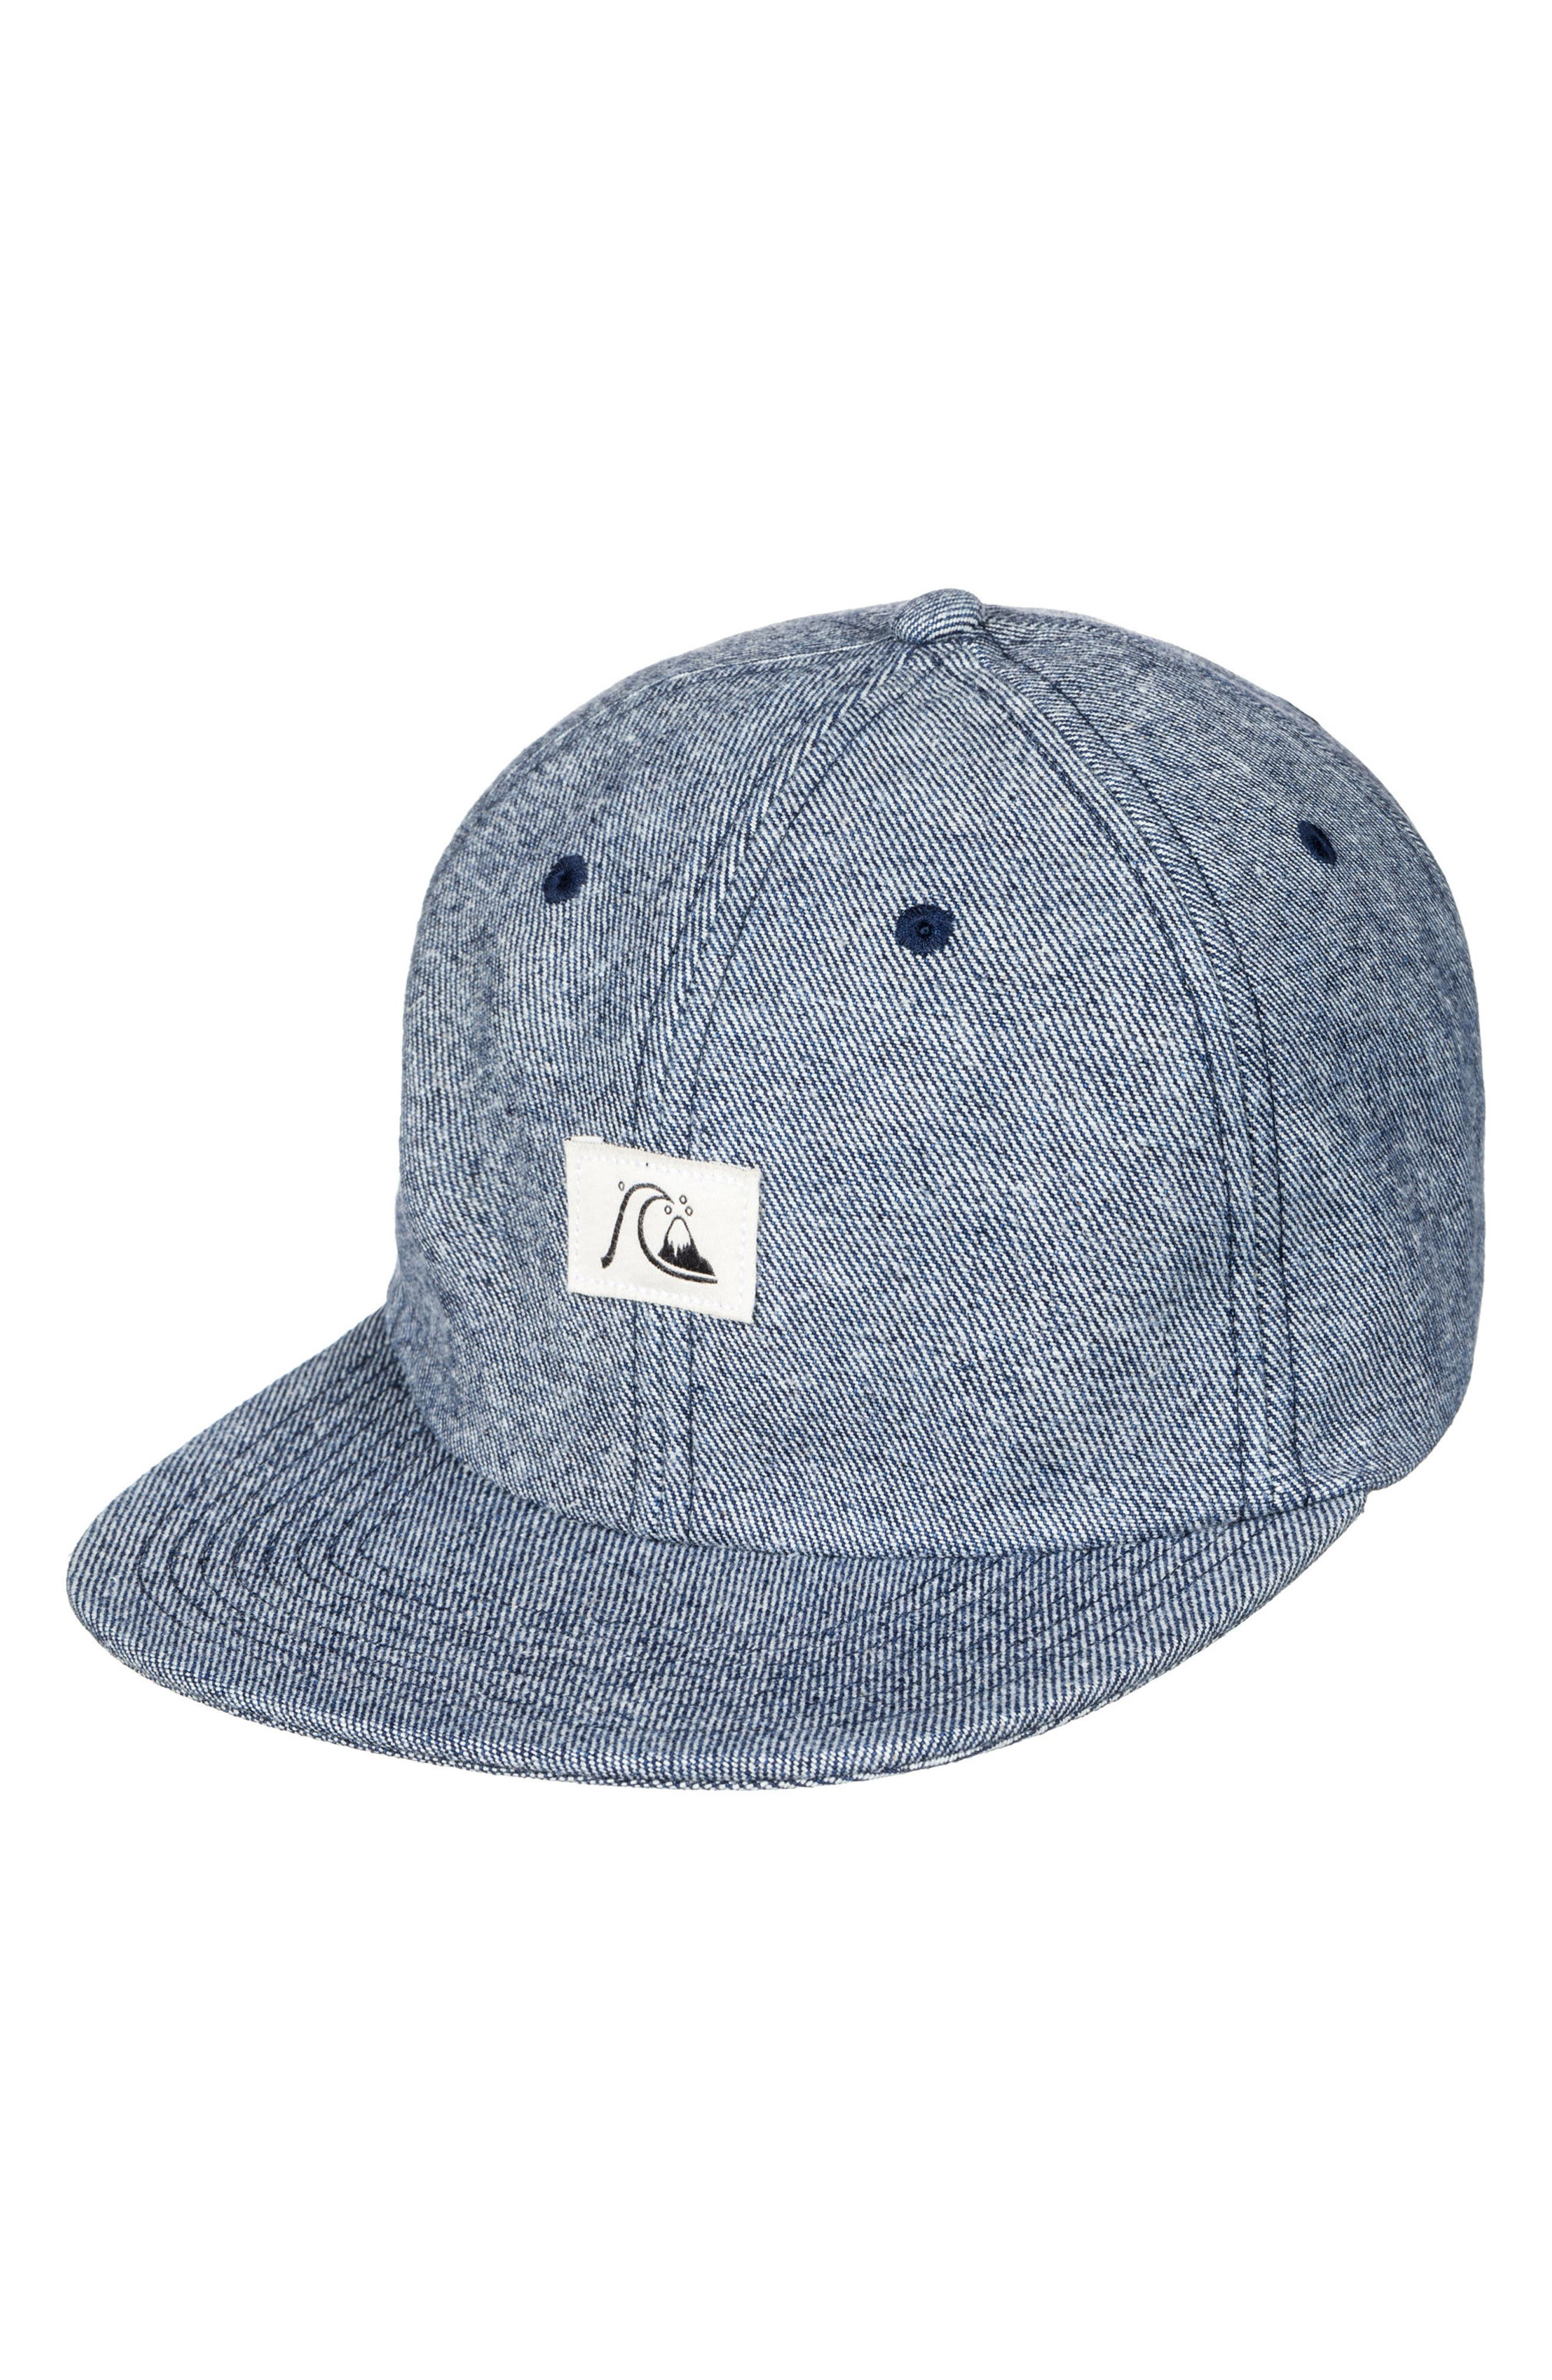 Pinchfield Snapback Baseball Cap,                         Main,                         color,